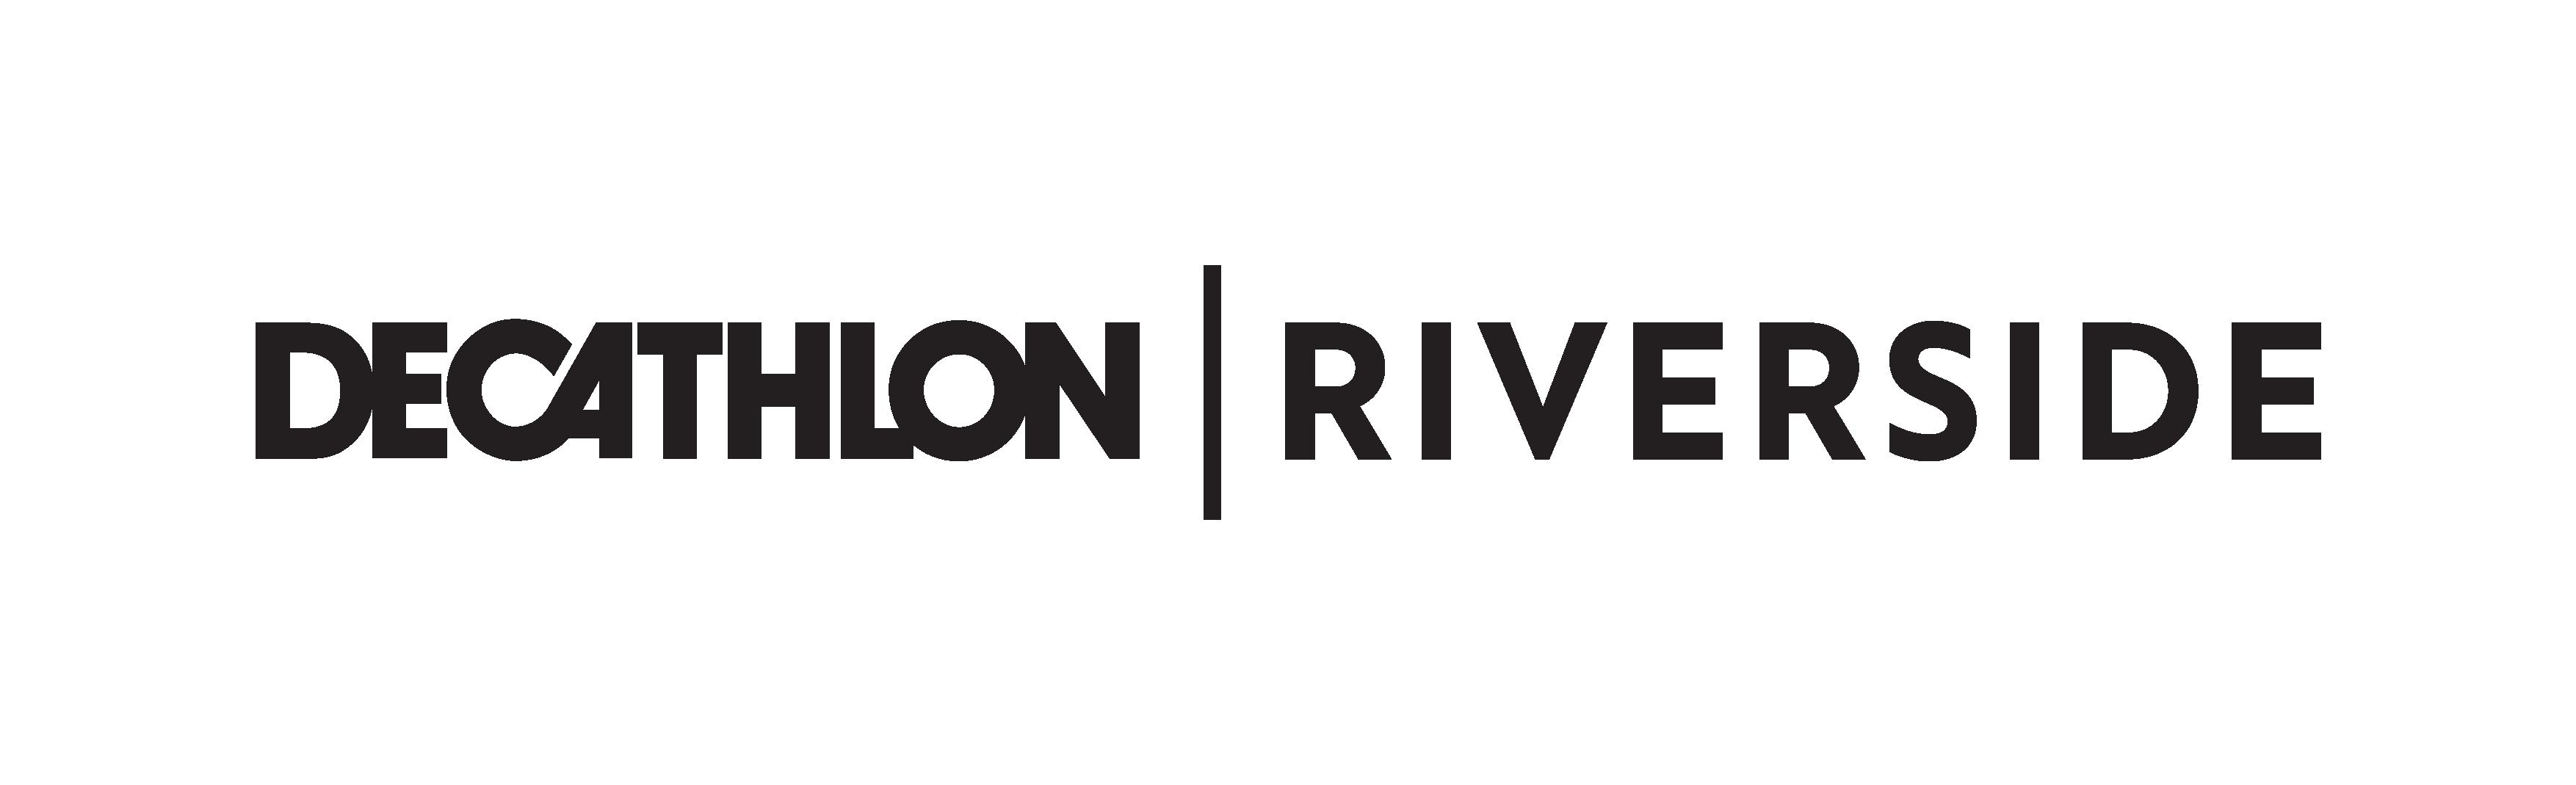 Decathlon Riverside